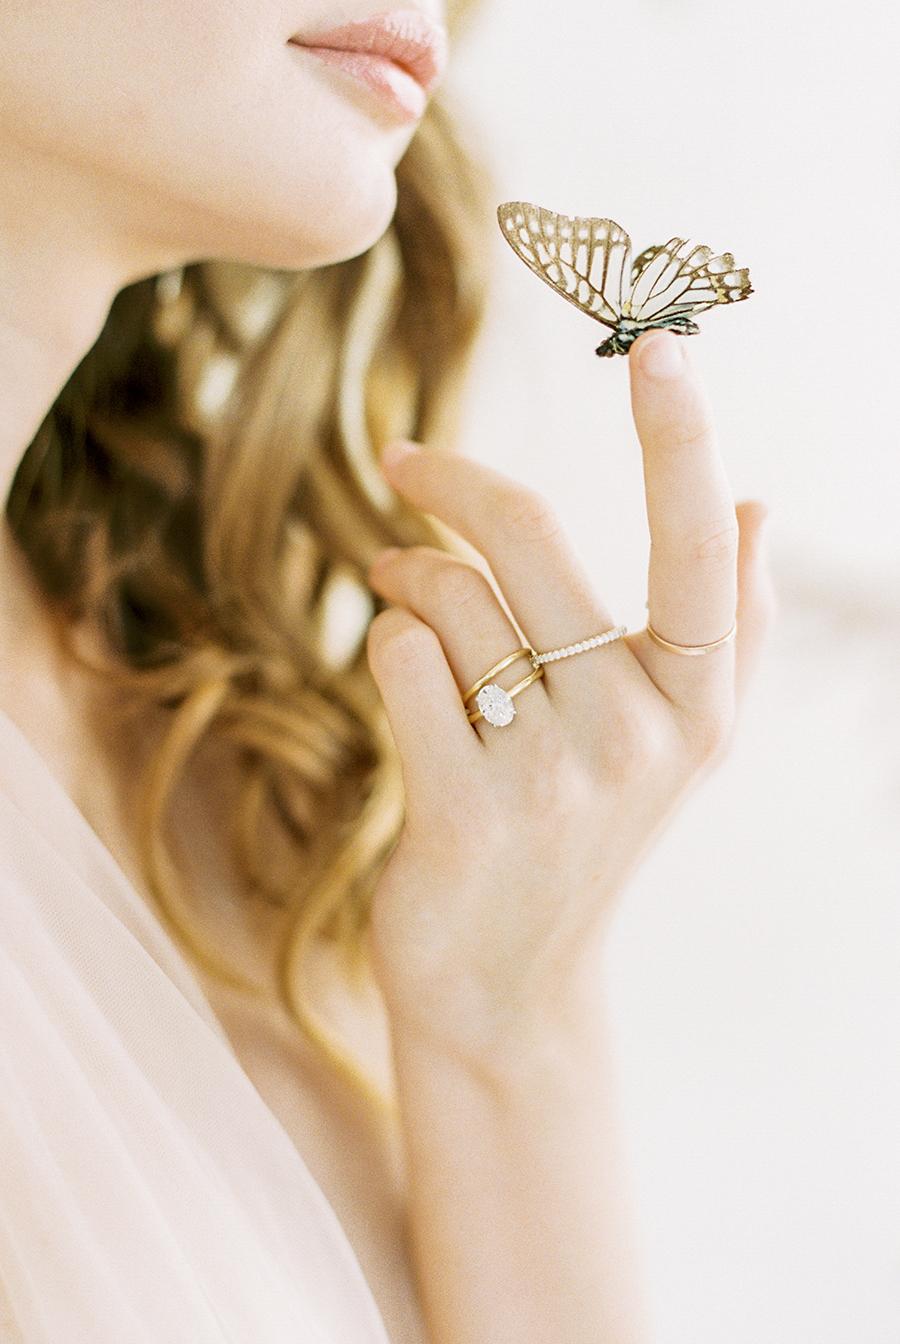 OTOGRAPHY_SHOP GOSSAMER_BUTTERFLY_LOS ANGELES WEDDING INSPIRATION-39.jpg